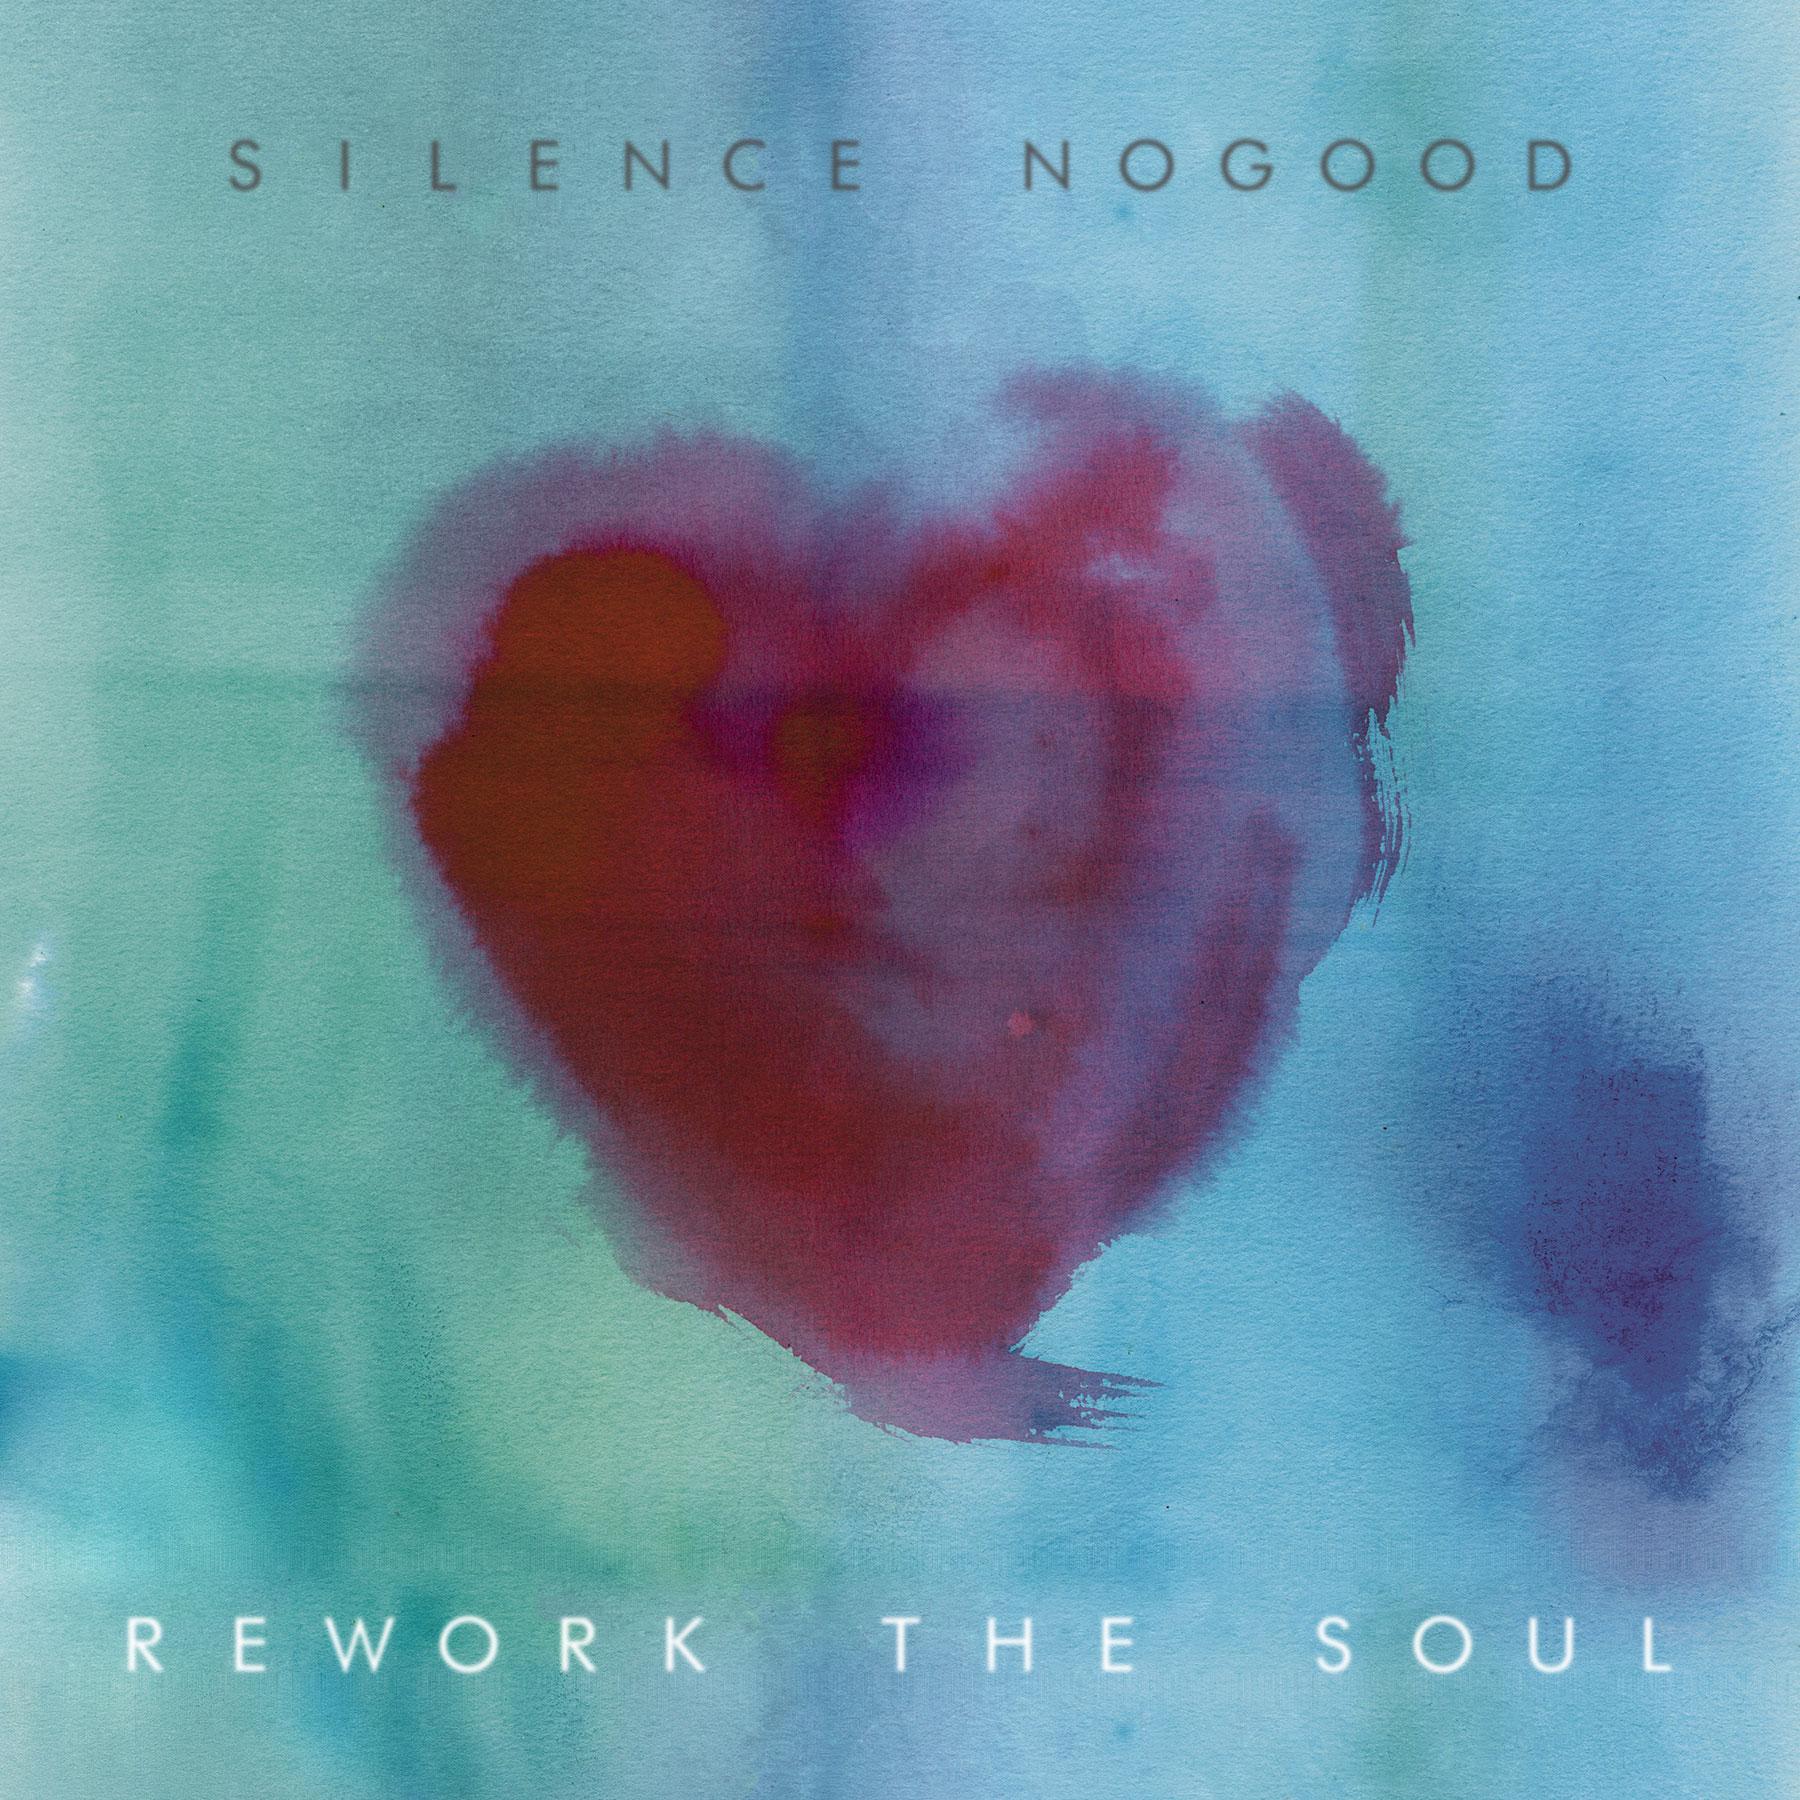 Rework the Soul